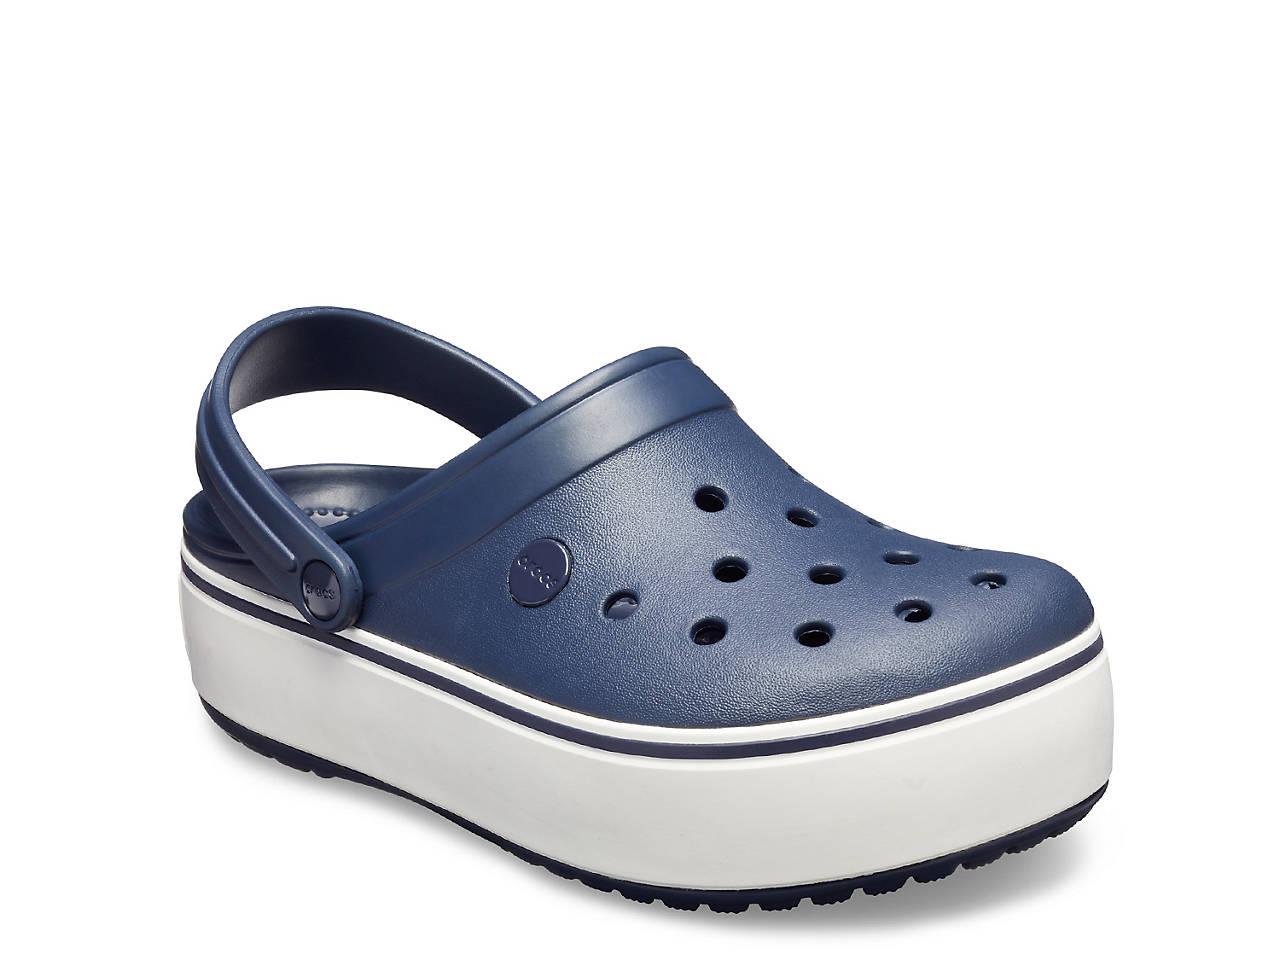 2d5129a87ad Crocs Crocband Platform Clog Women s Shoes